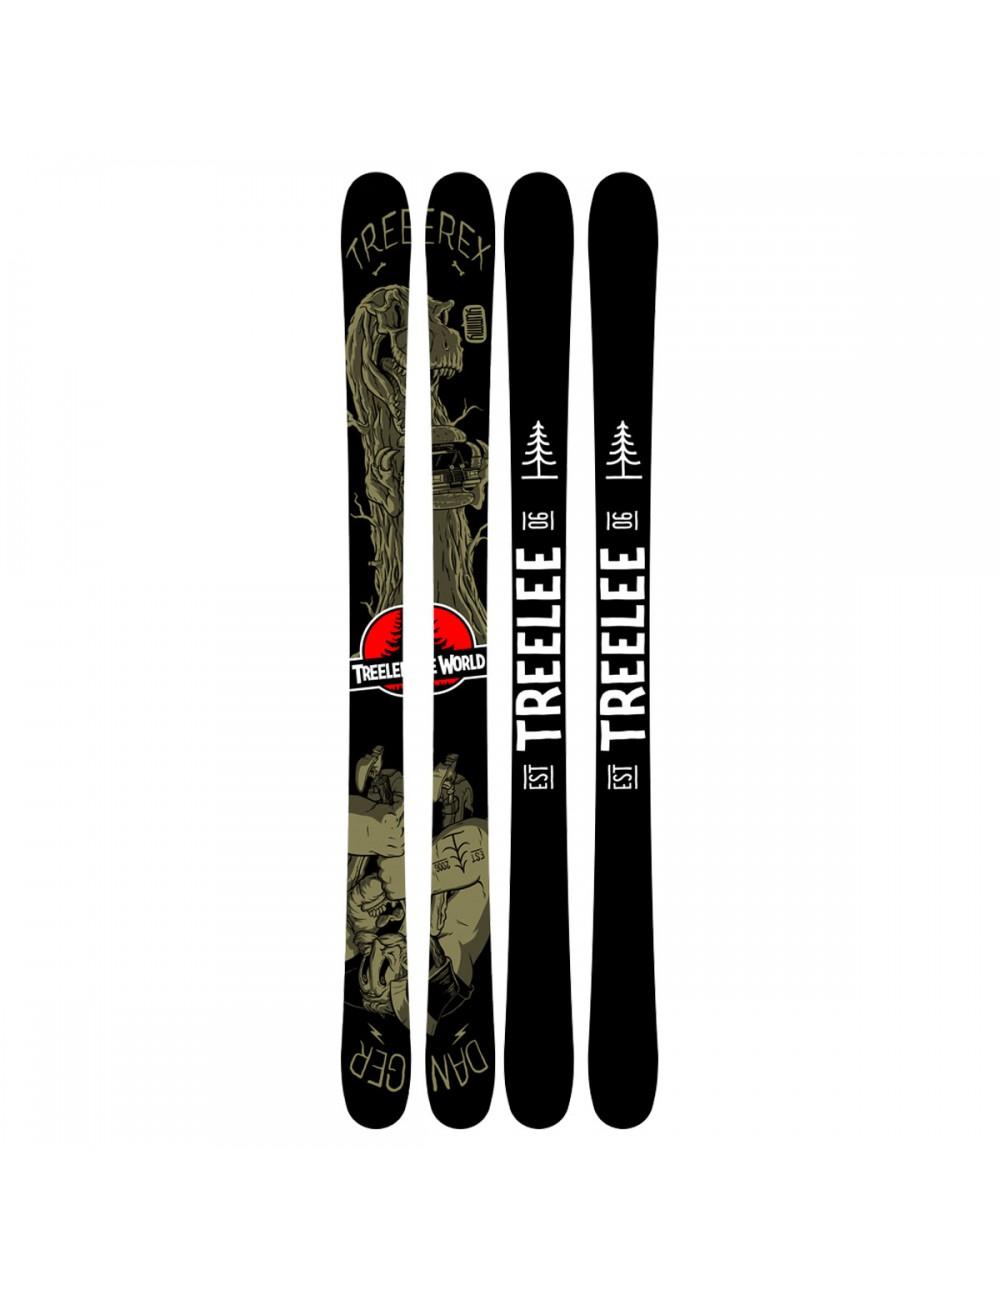 TreeLee World 170cm Ski_11253